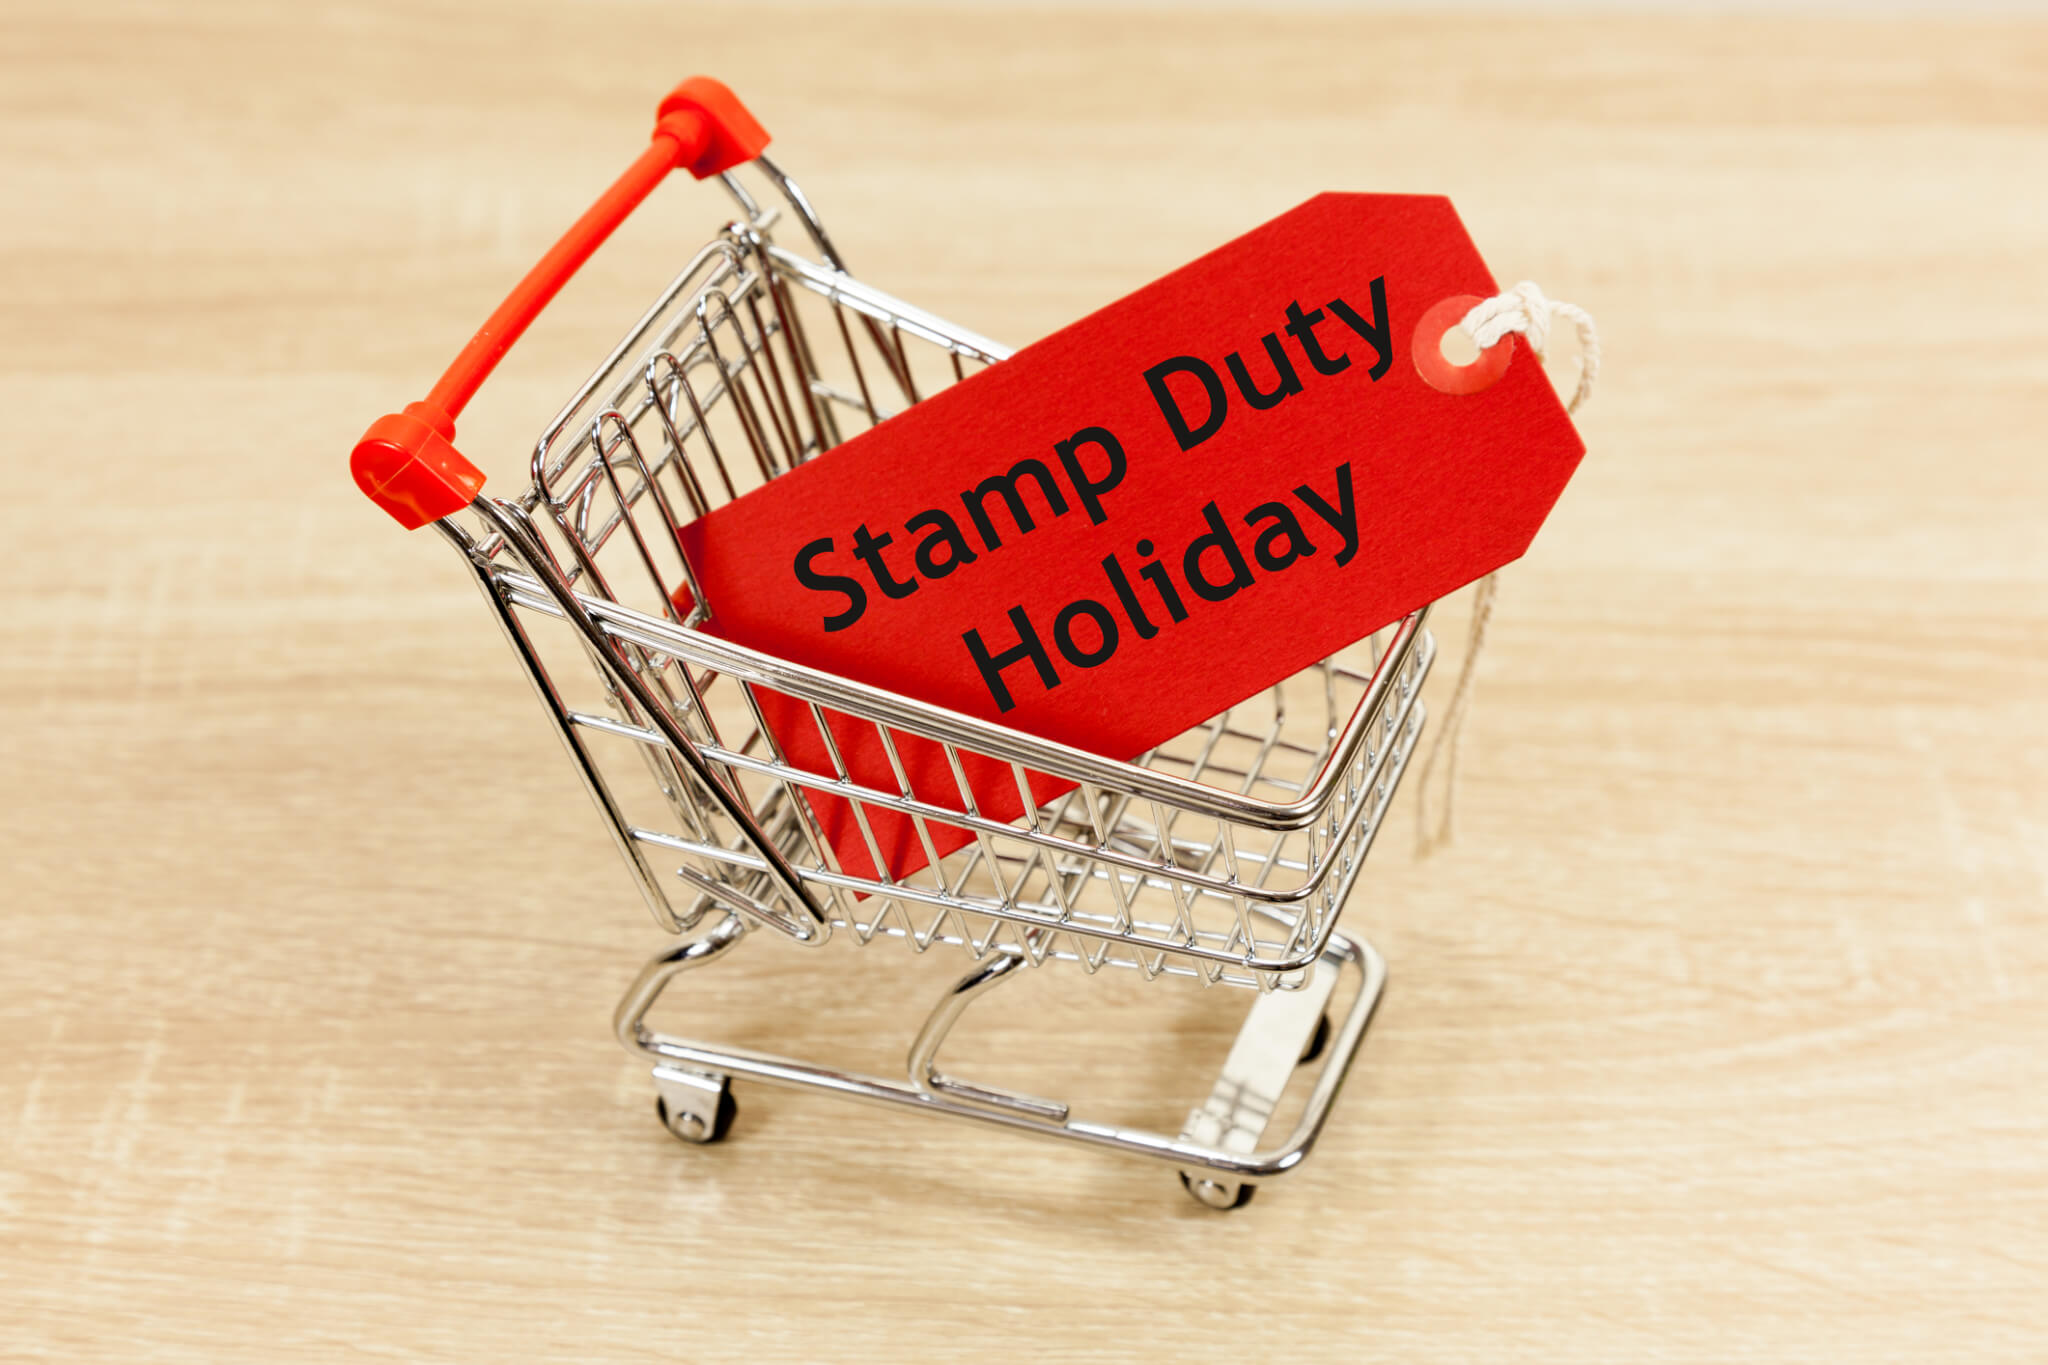 Stamp Duty Holiday - Truuli